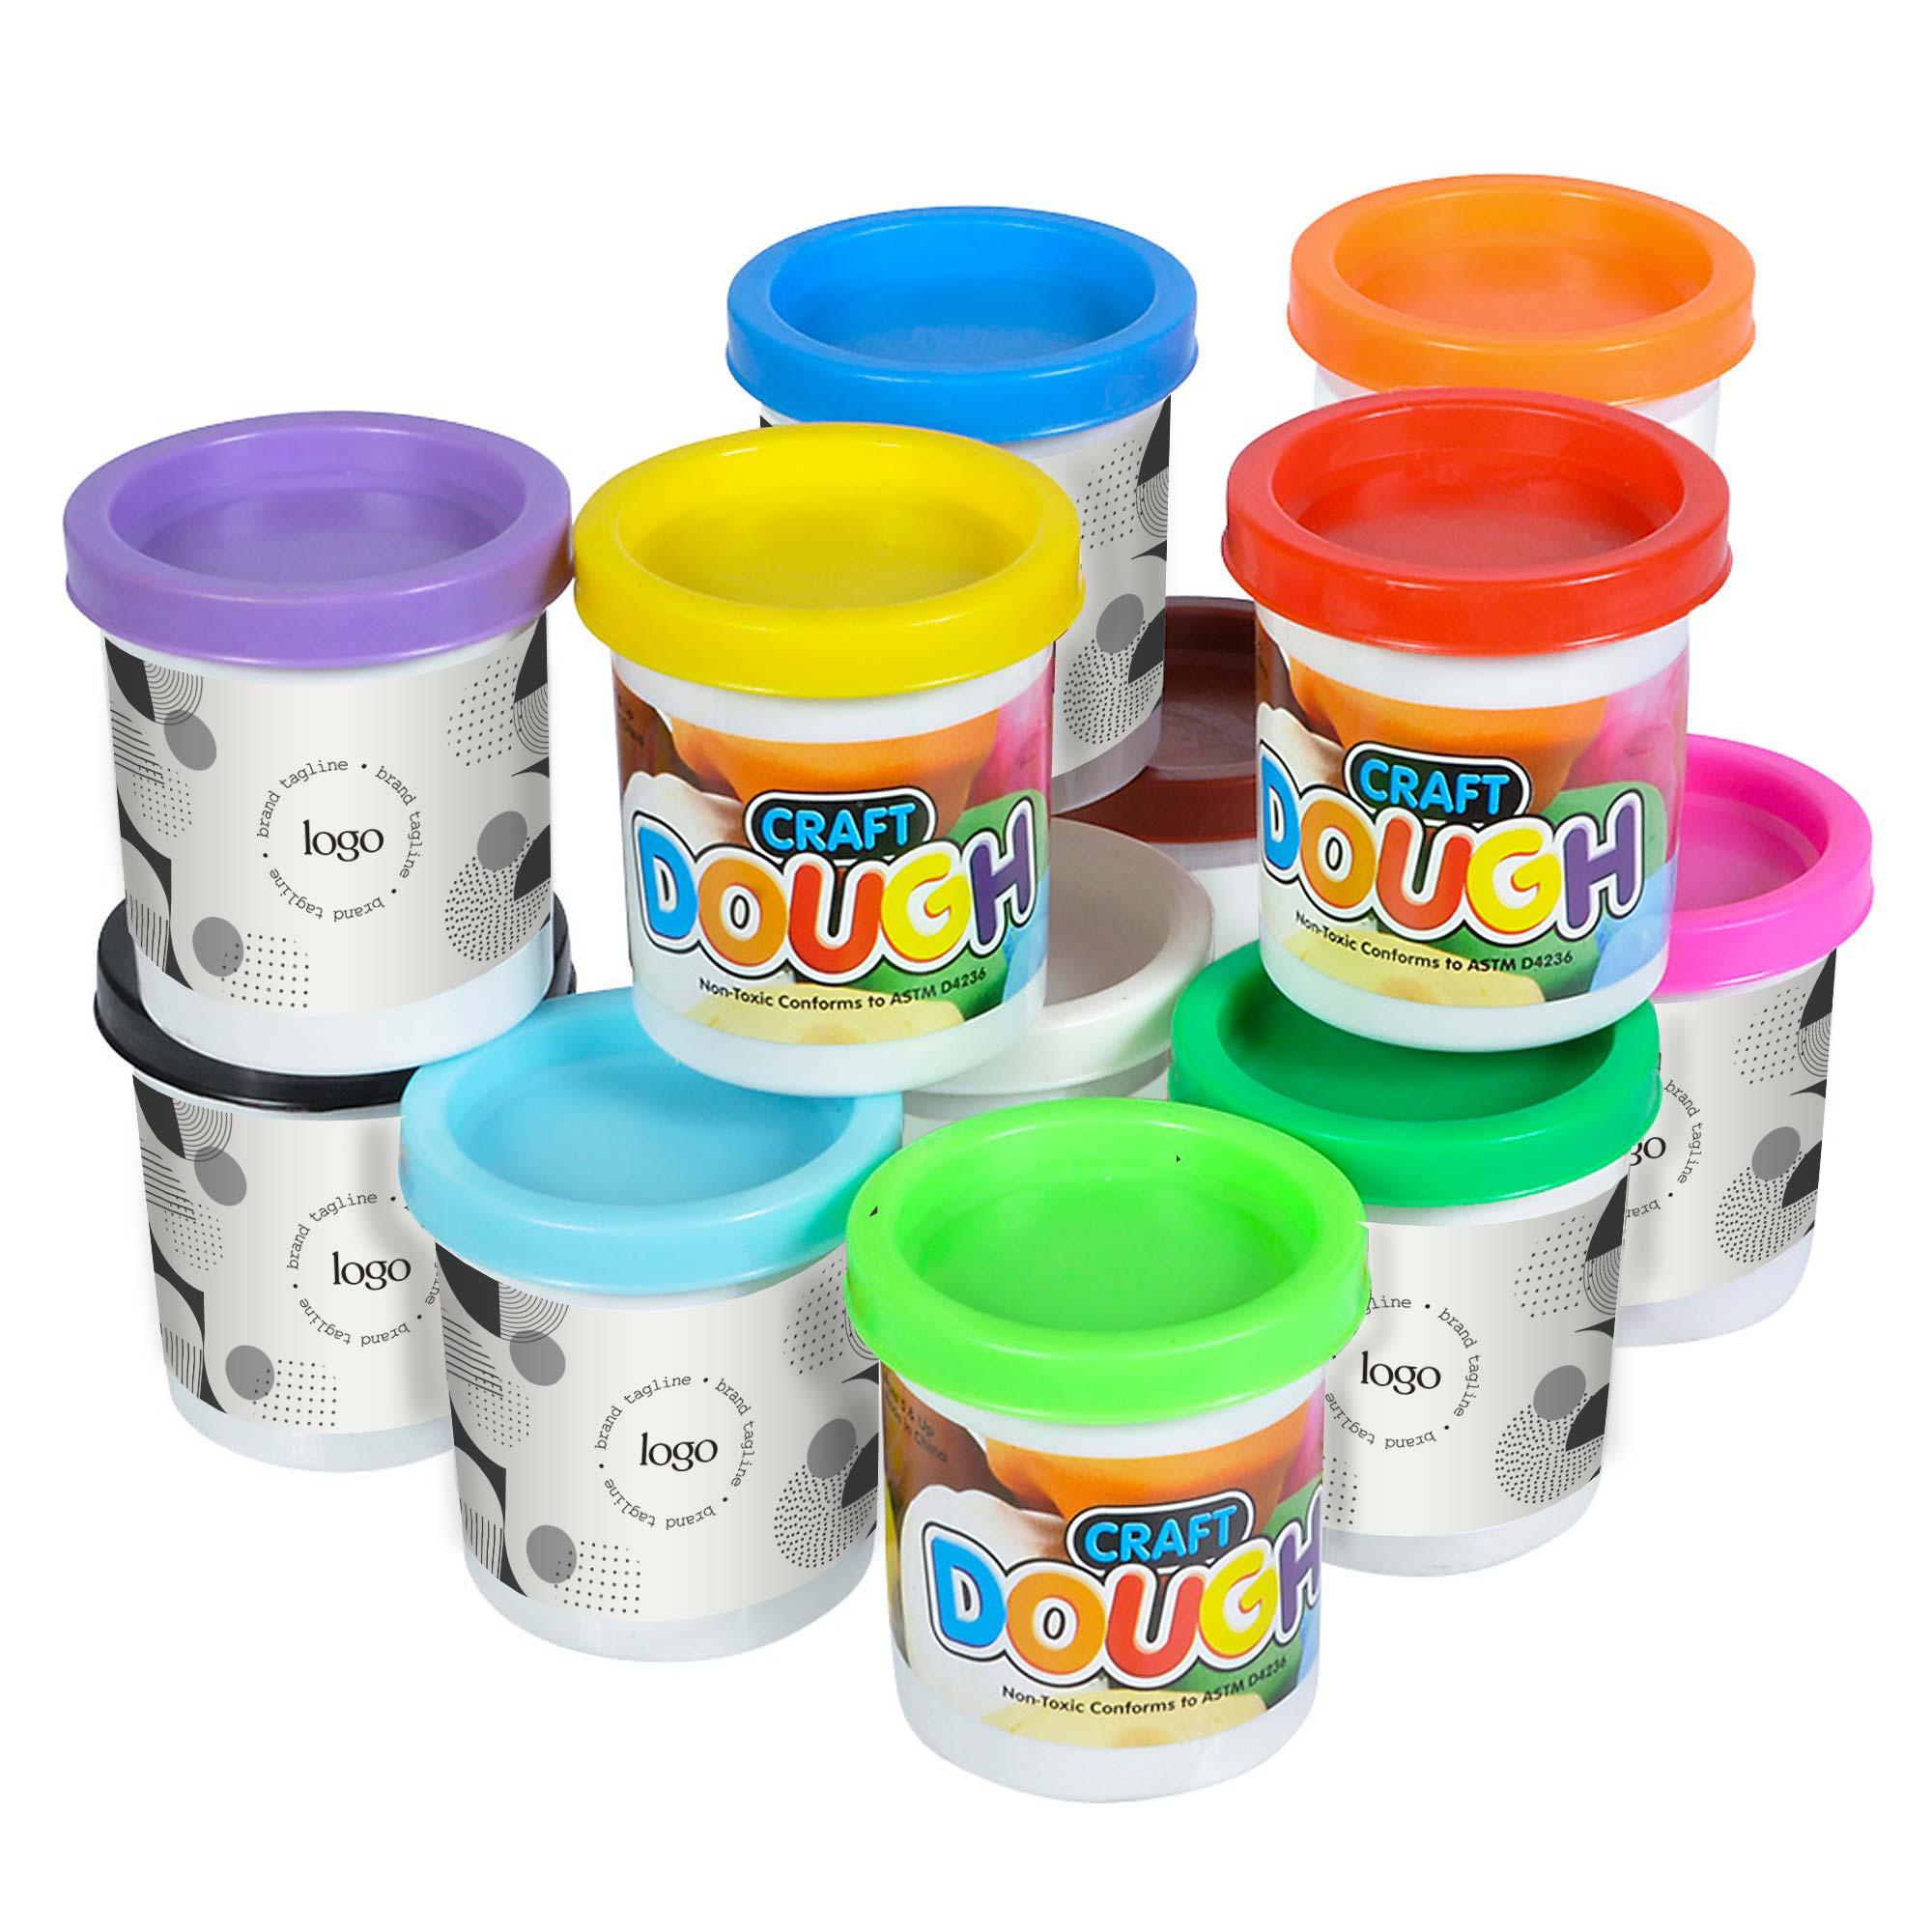 302338 create dough full color label 2 5 x 1 5